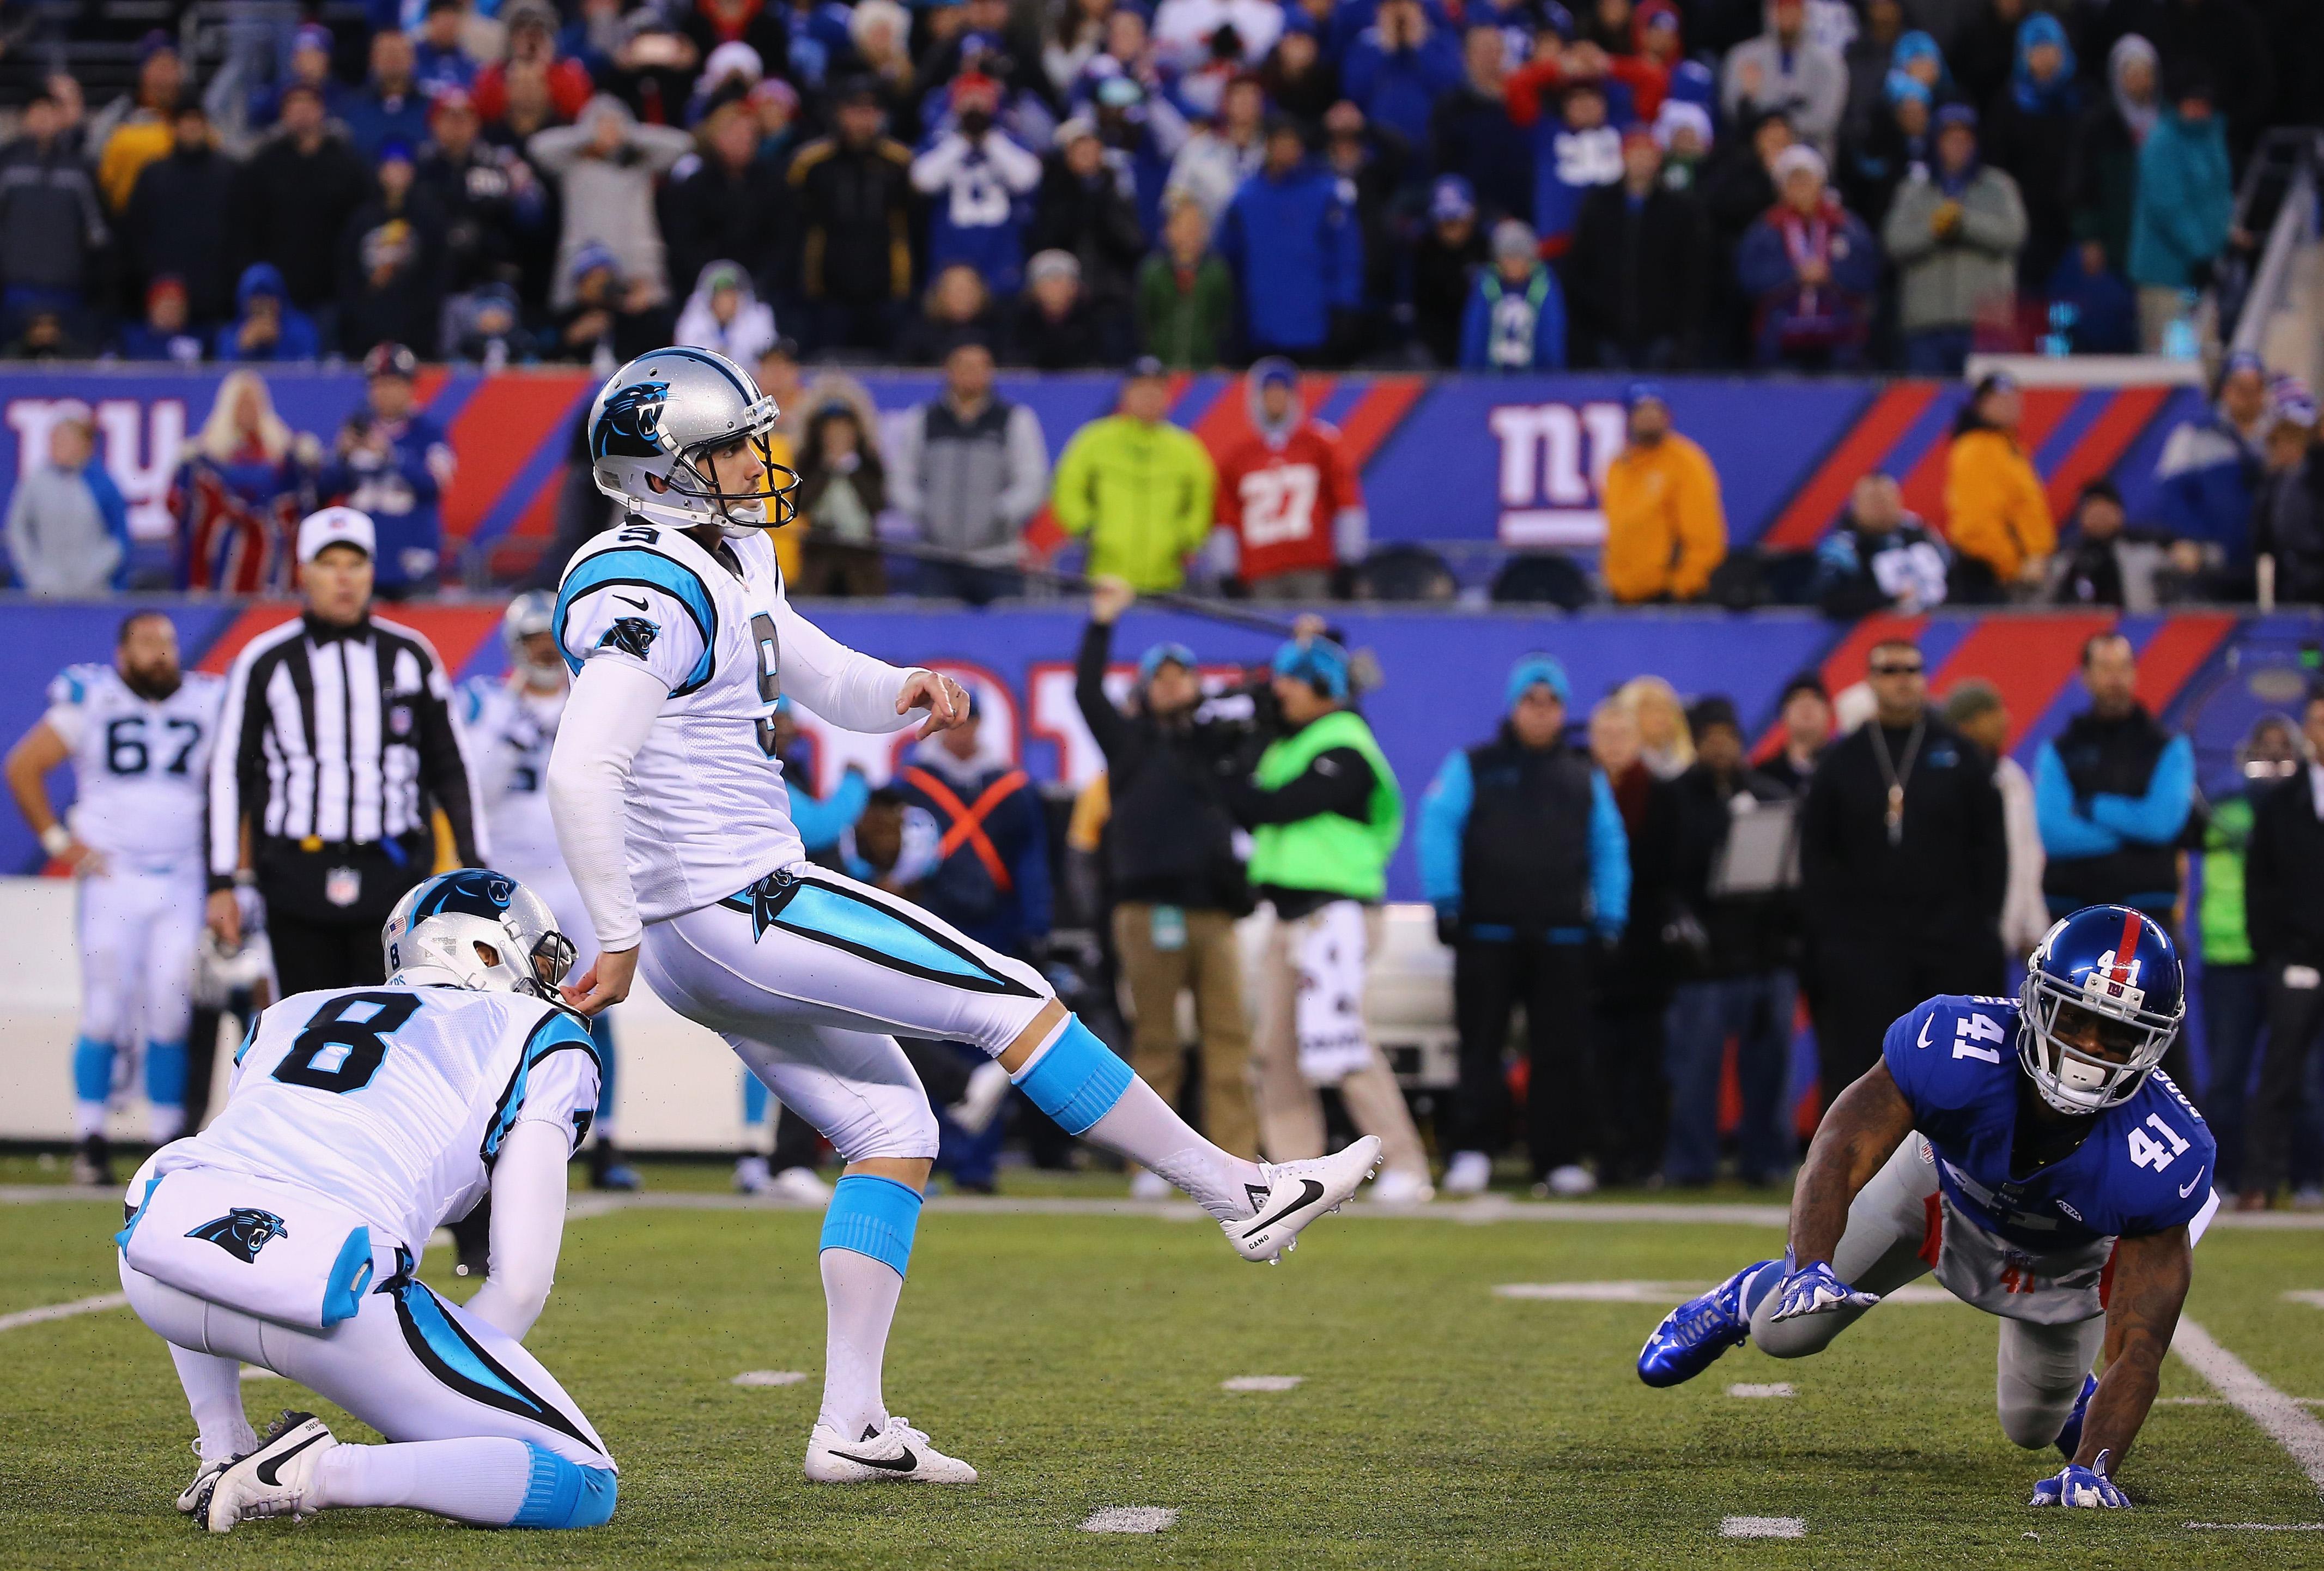 Graham Gano of Carolina hits the game-winning field goal on Sunday